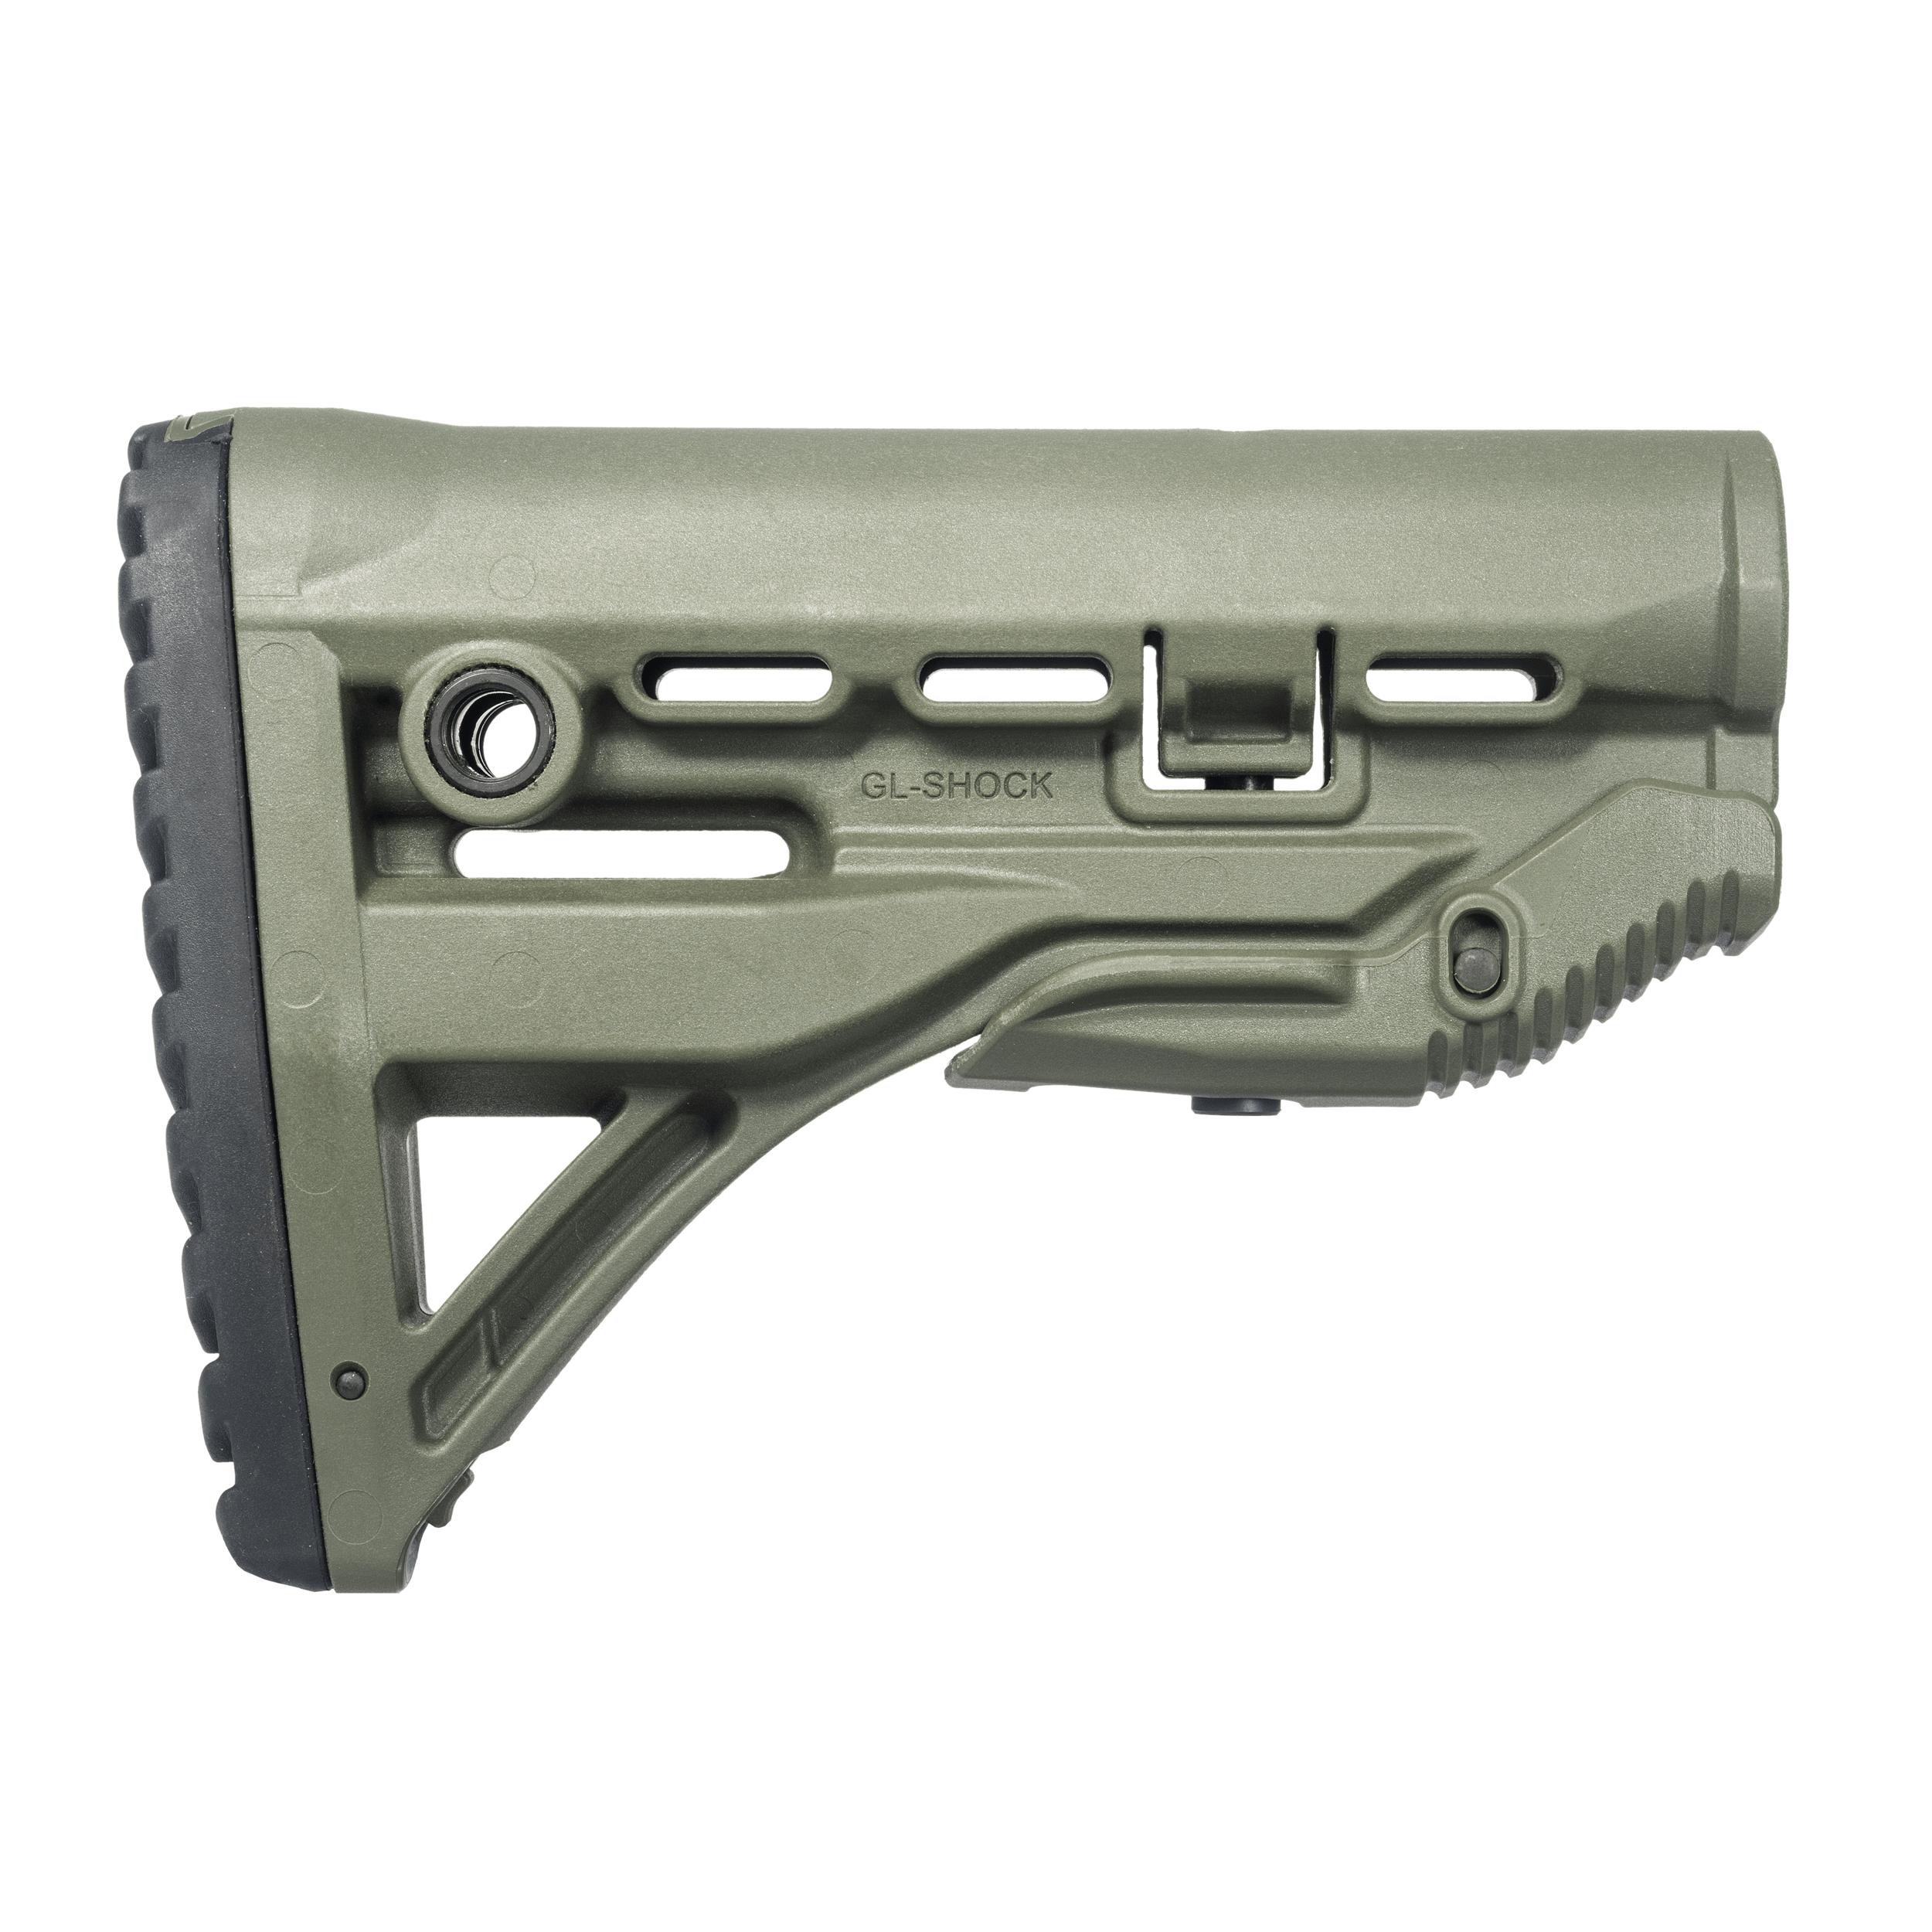 Buttstock AR15 / M16 / M4 Style / Shock Absorbing